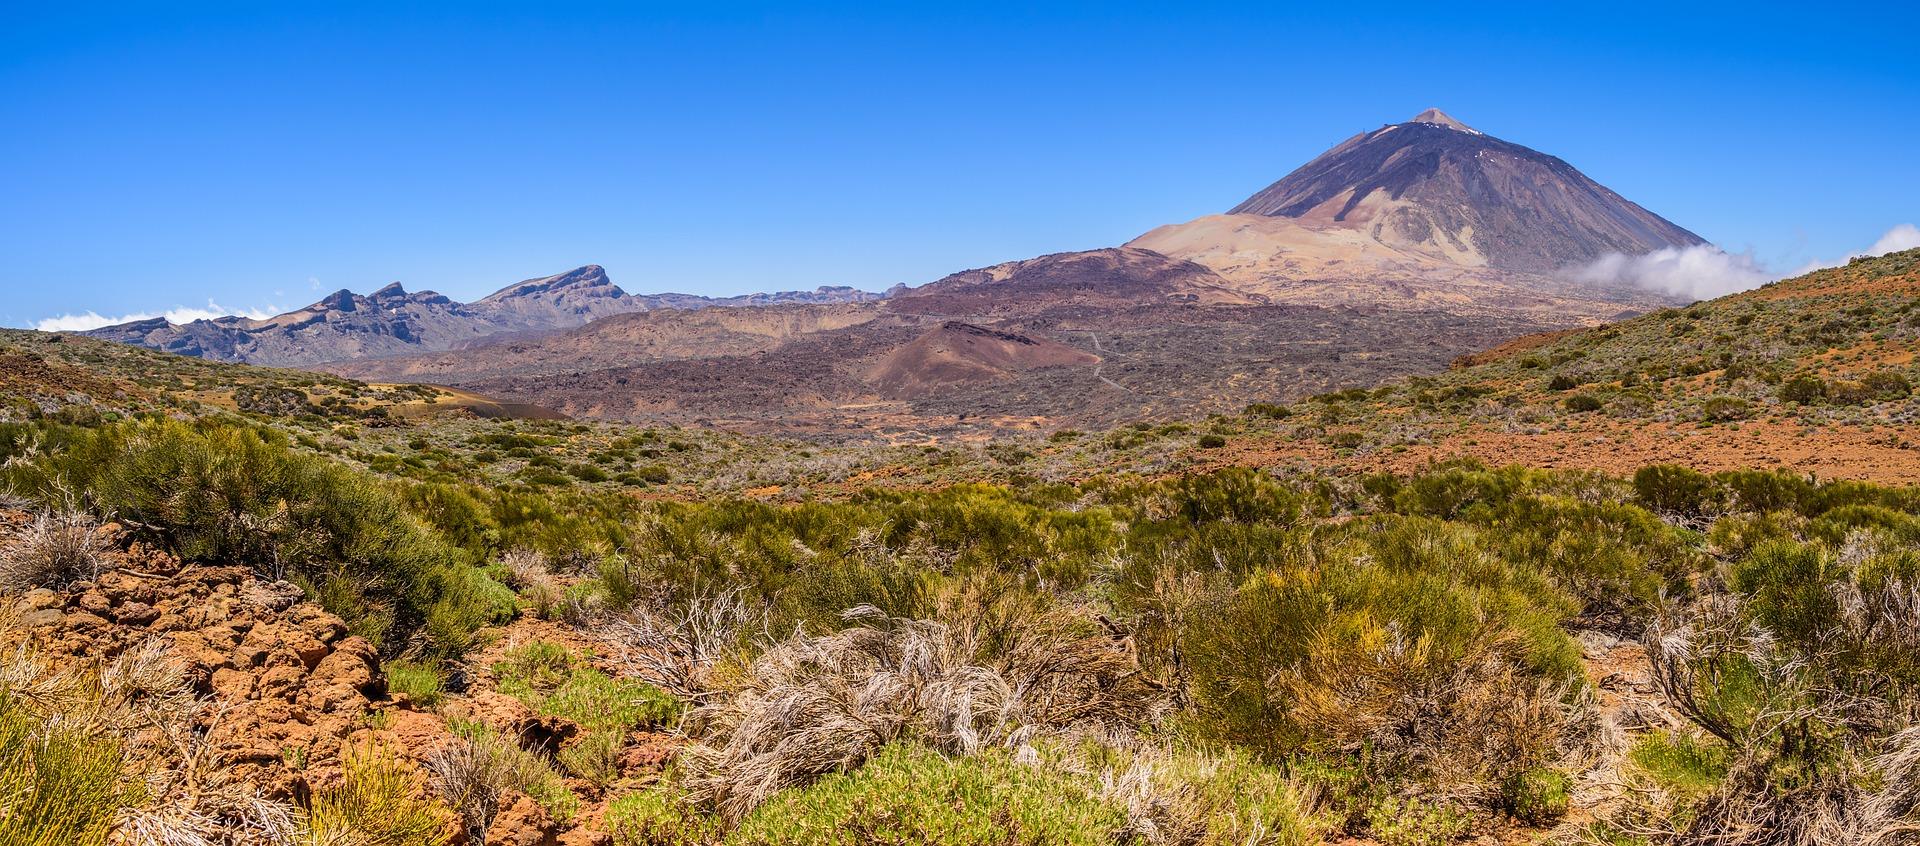 teide-national-park-1390915_1920